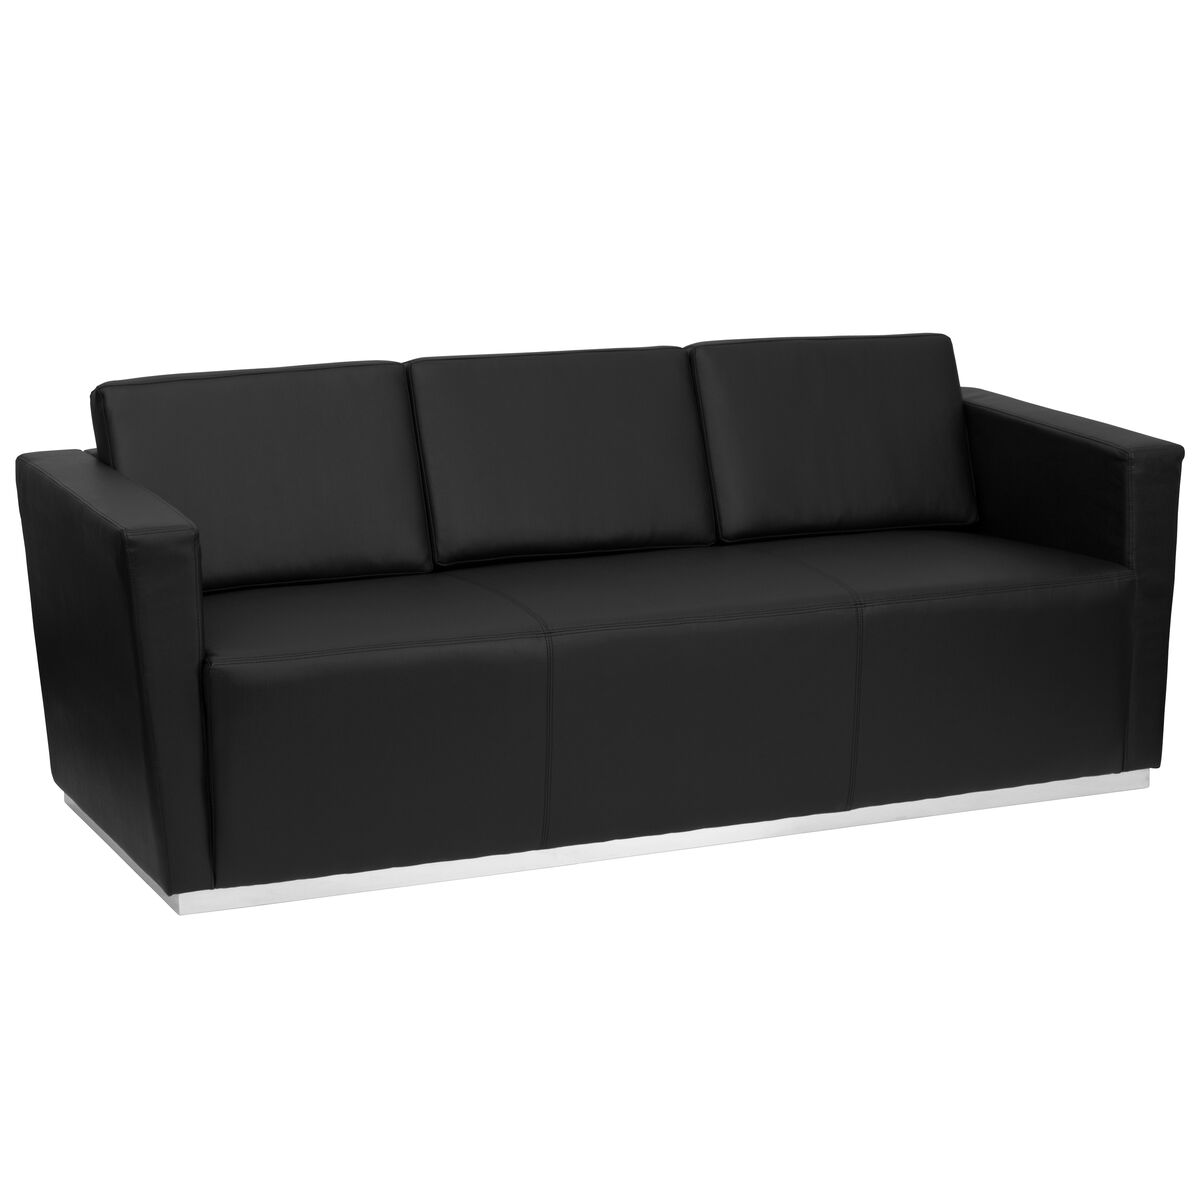 Black Leather Sofa Office: Flash Furniture ZB-TRINITY-8094-SOFA-BK-GG